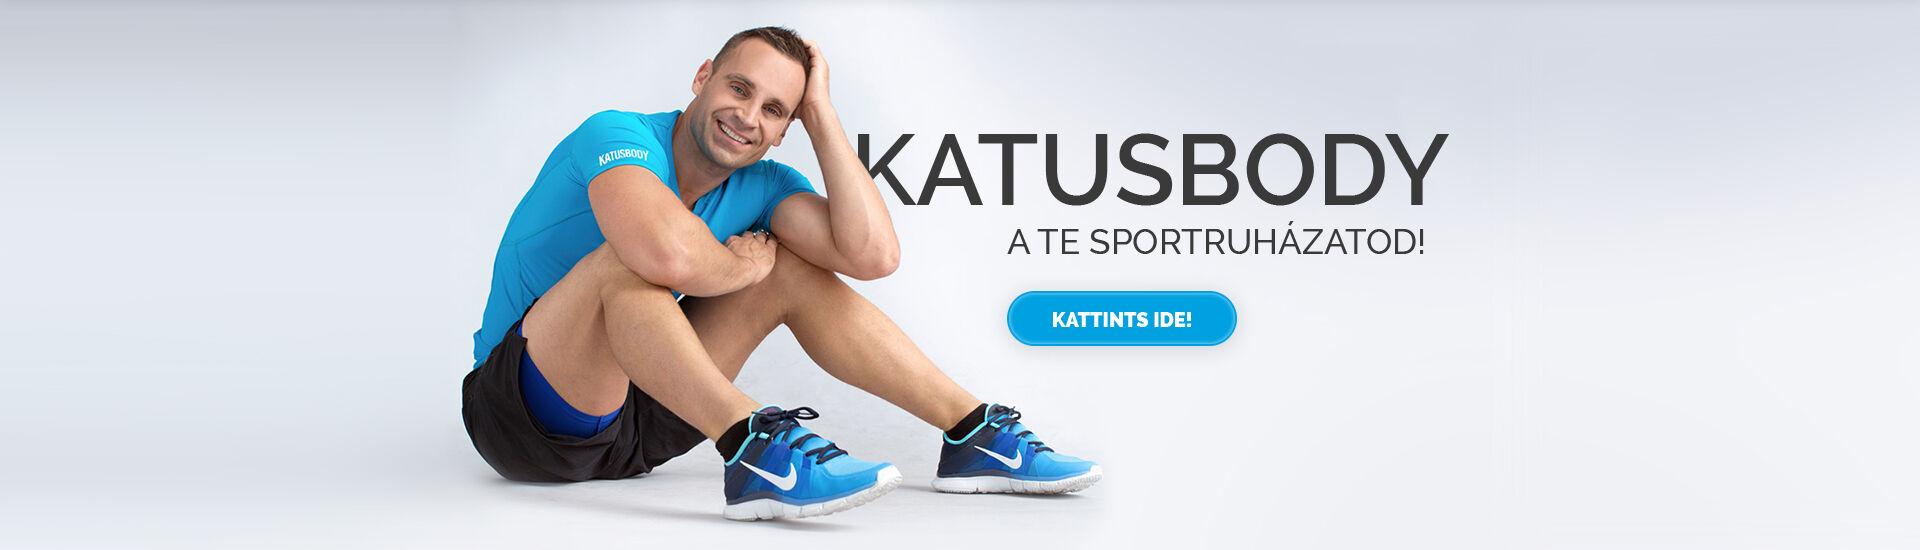 Katusbody1